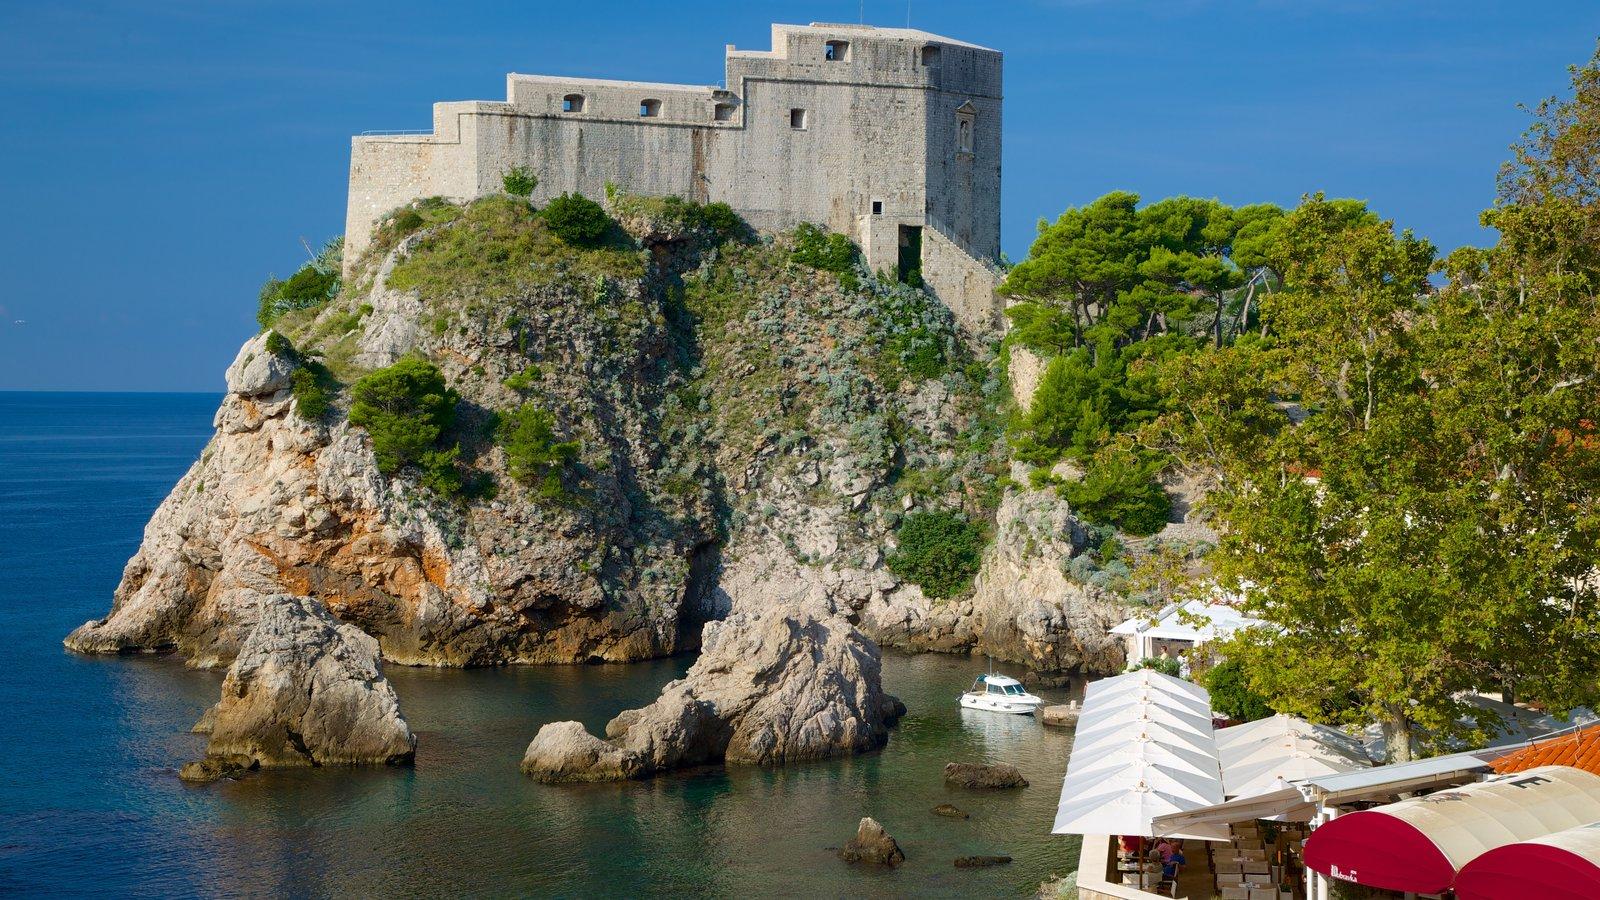 Fortaleza de Lovrijenac mostrando elementos de patrimônio e paisagens litorâneas